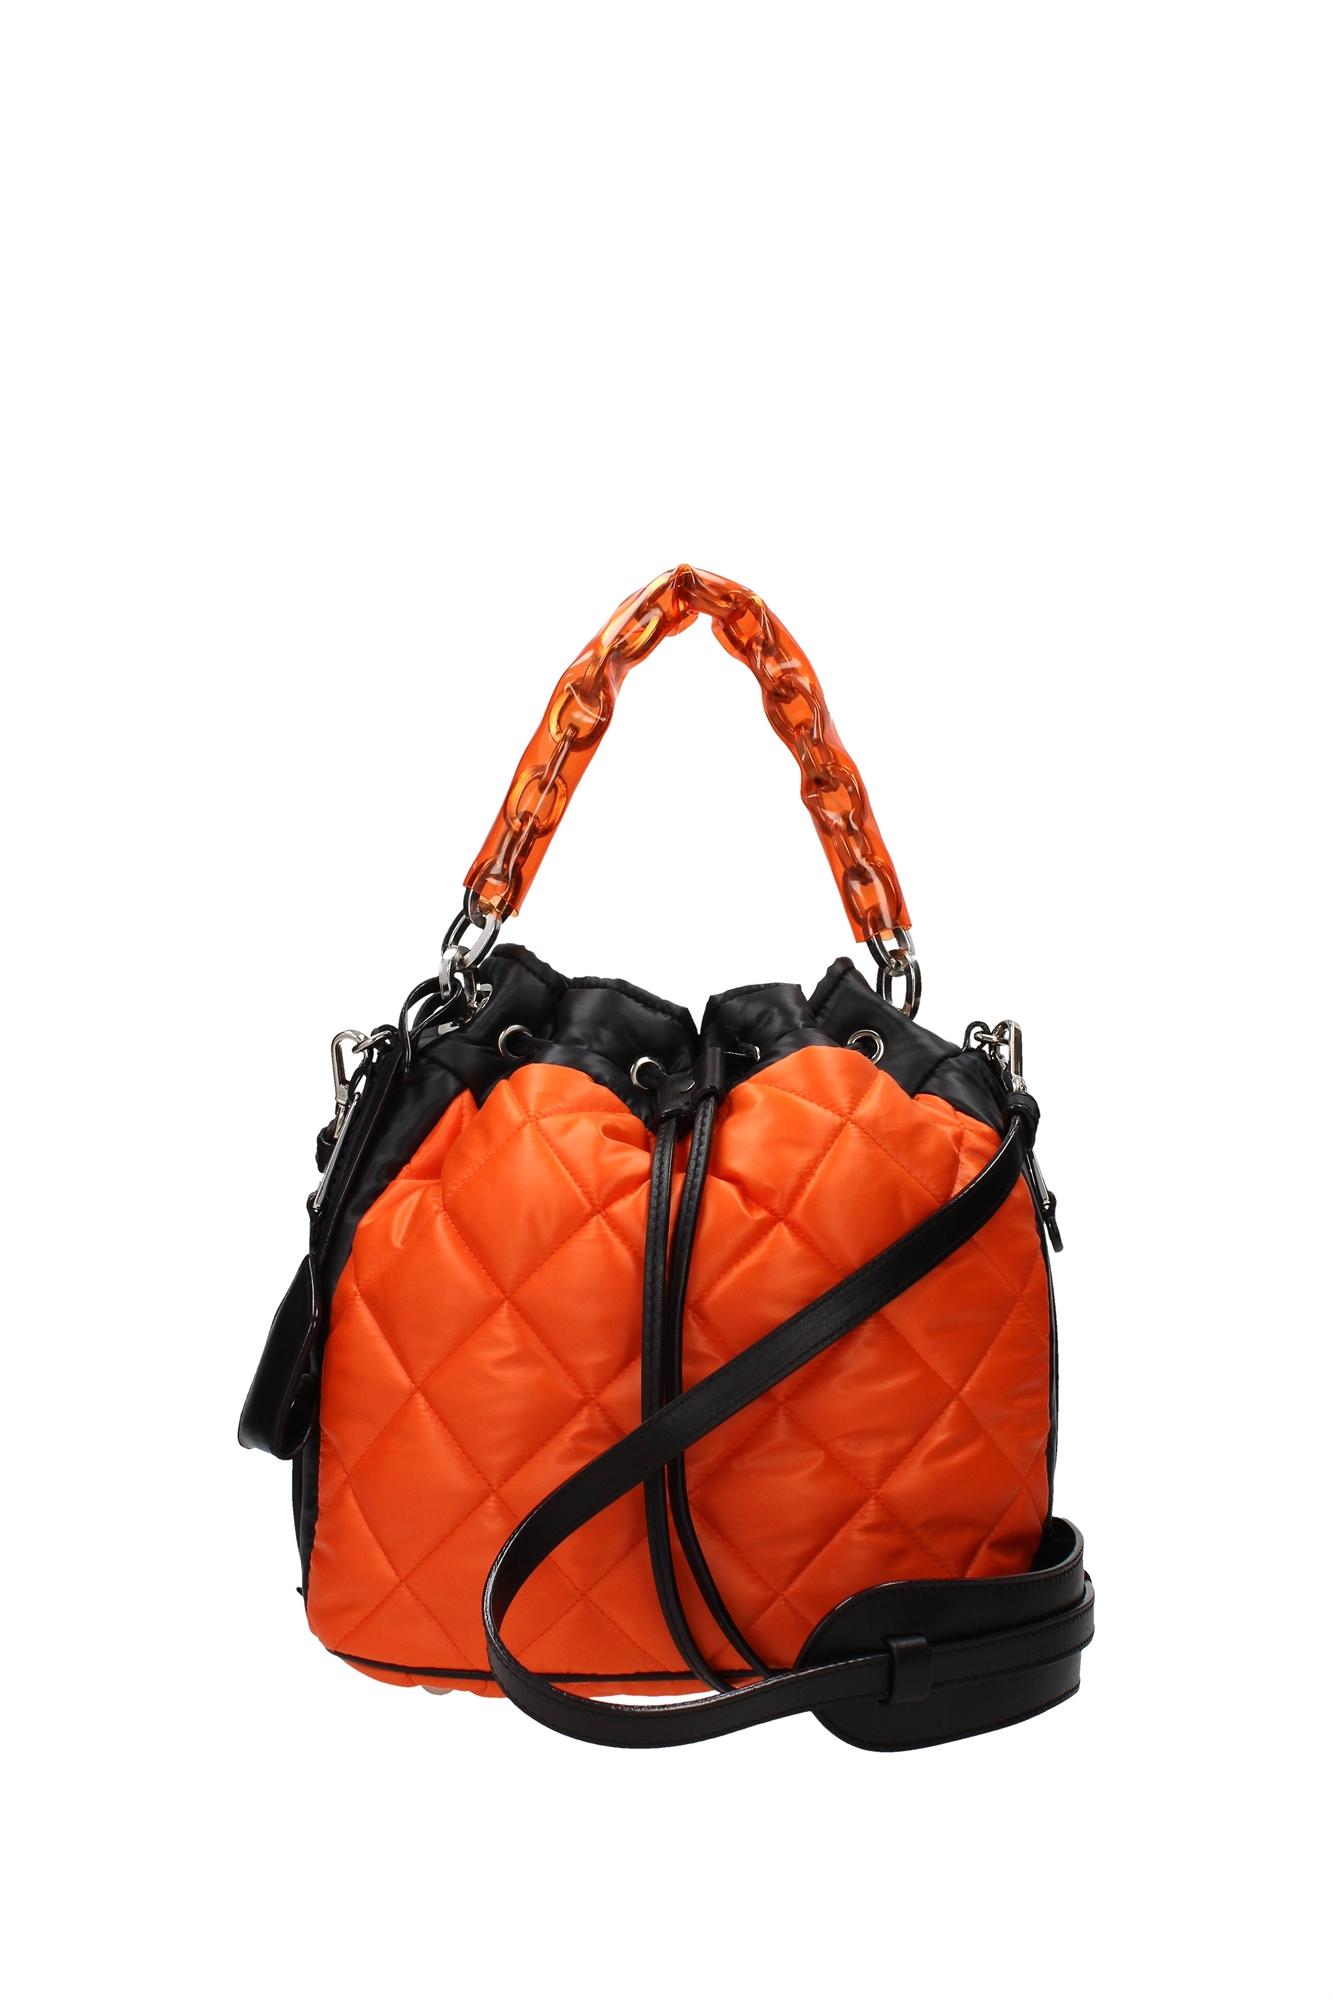 Borse A Mano Moschino : Borse a mano moschino donna poliammide arancio